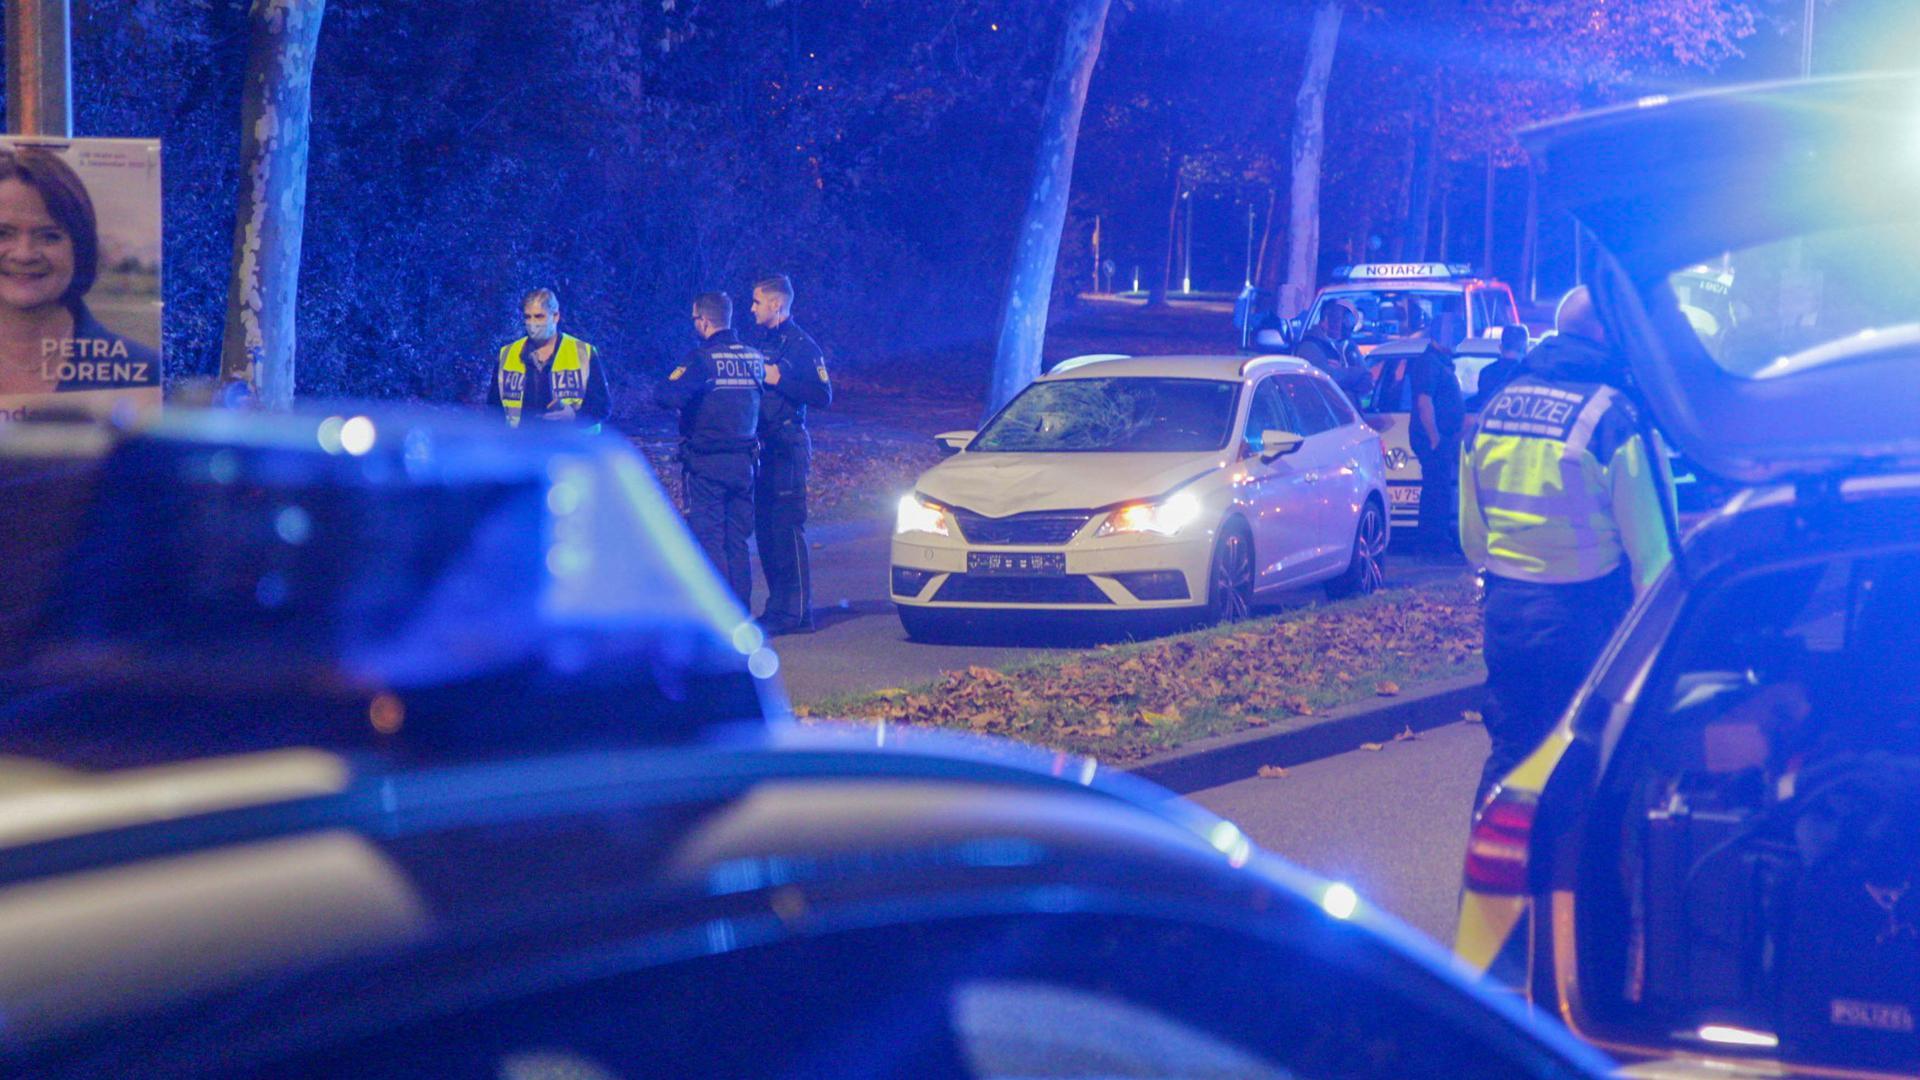 Polizei Autos Abend